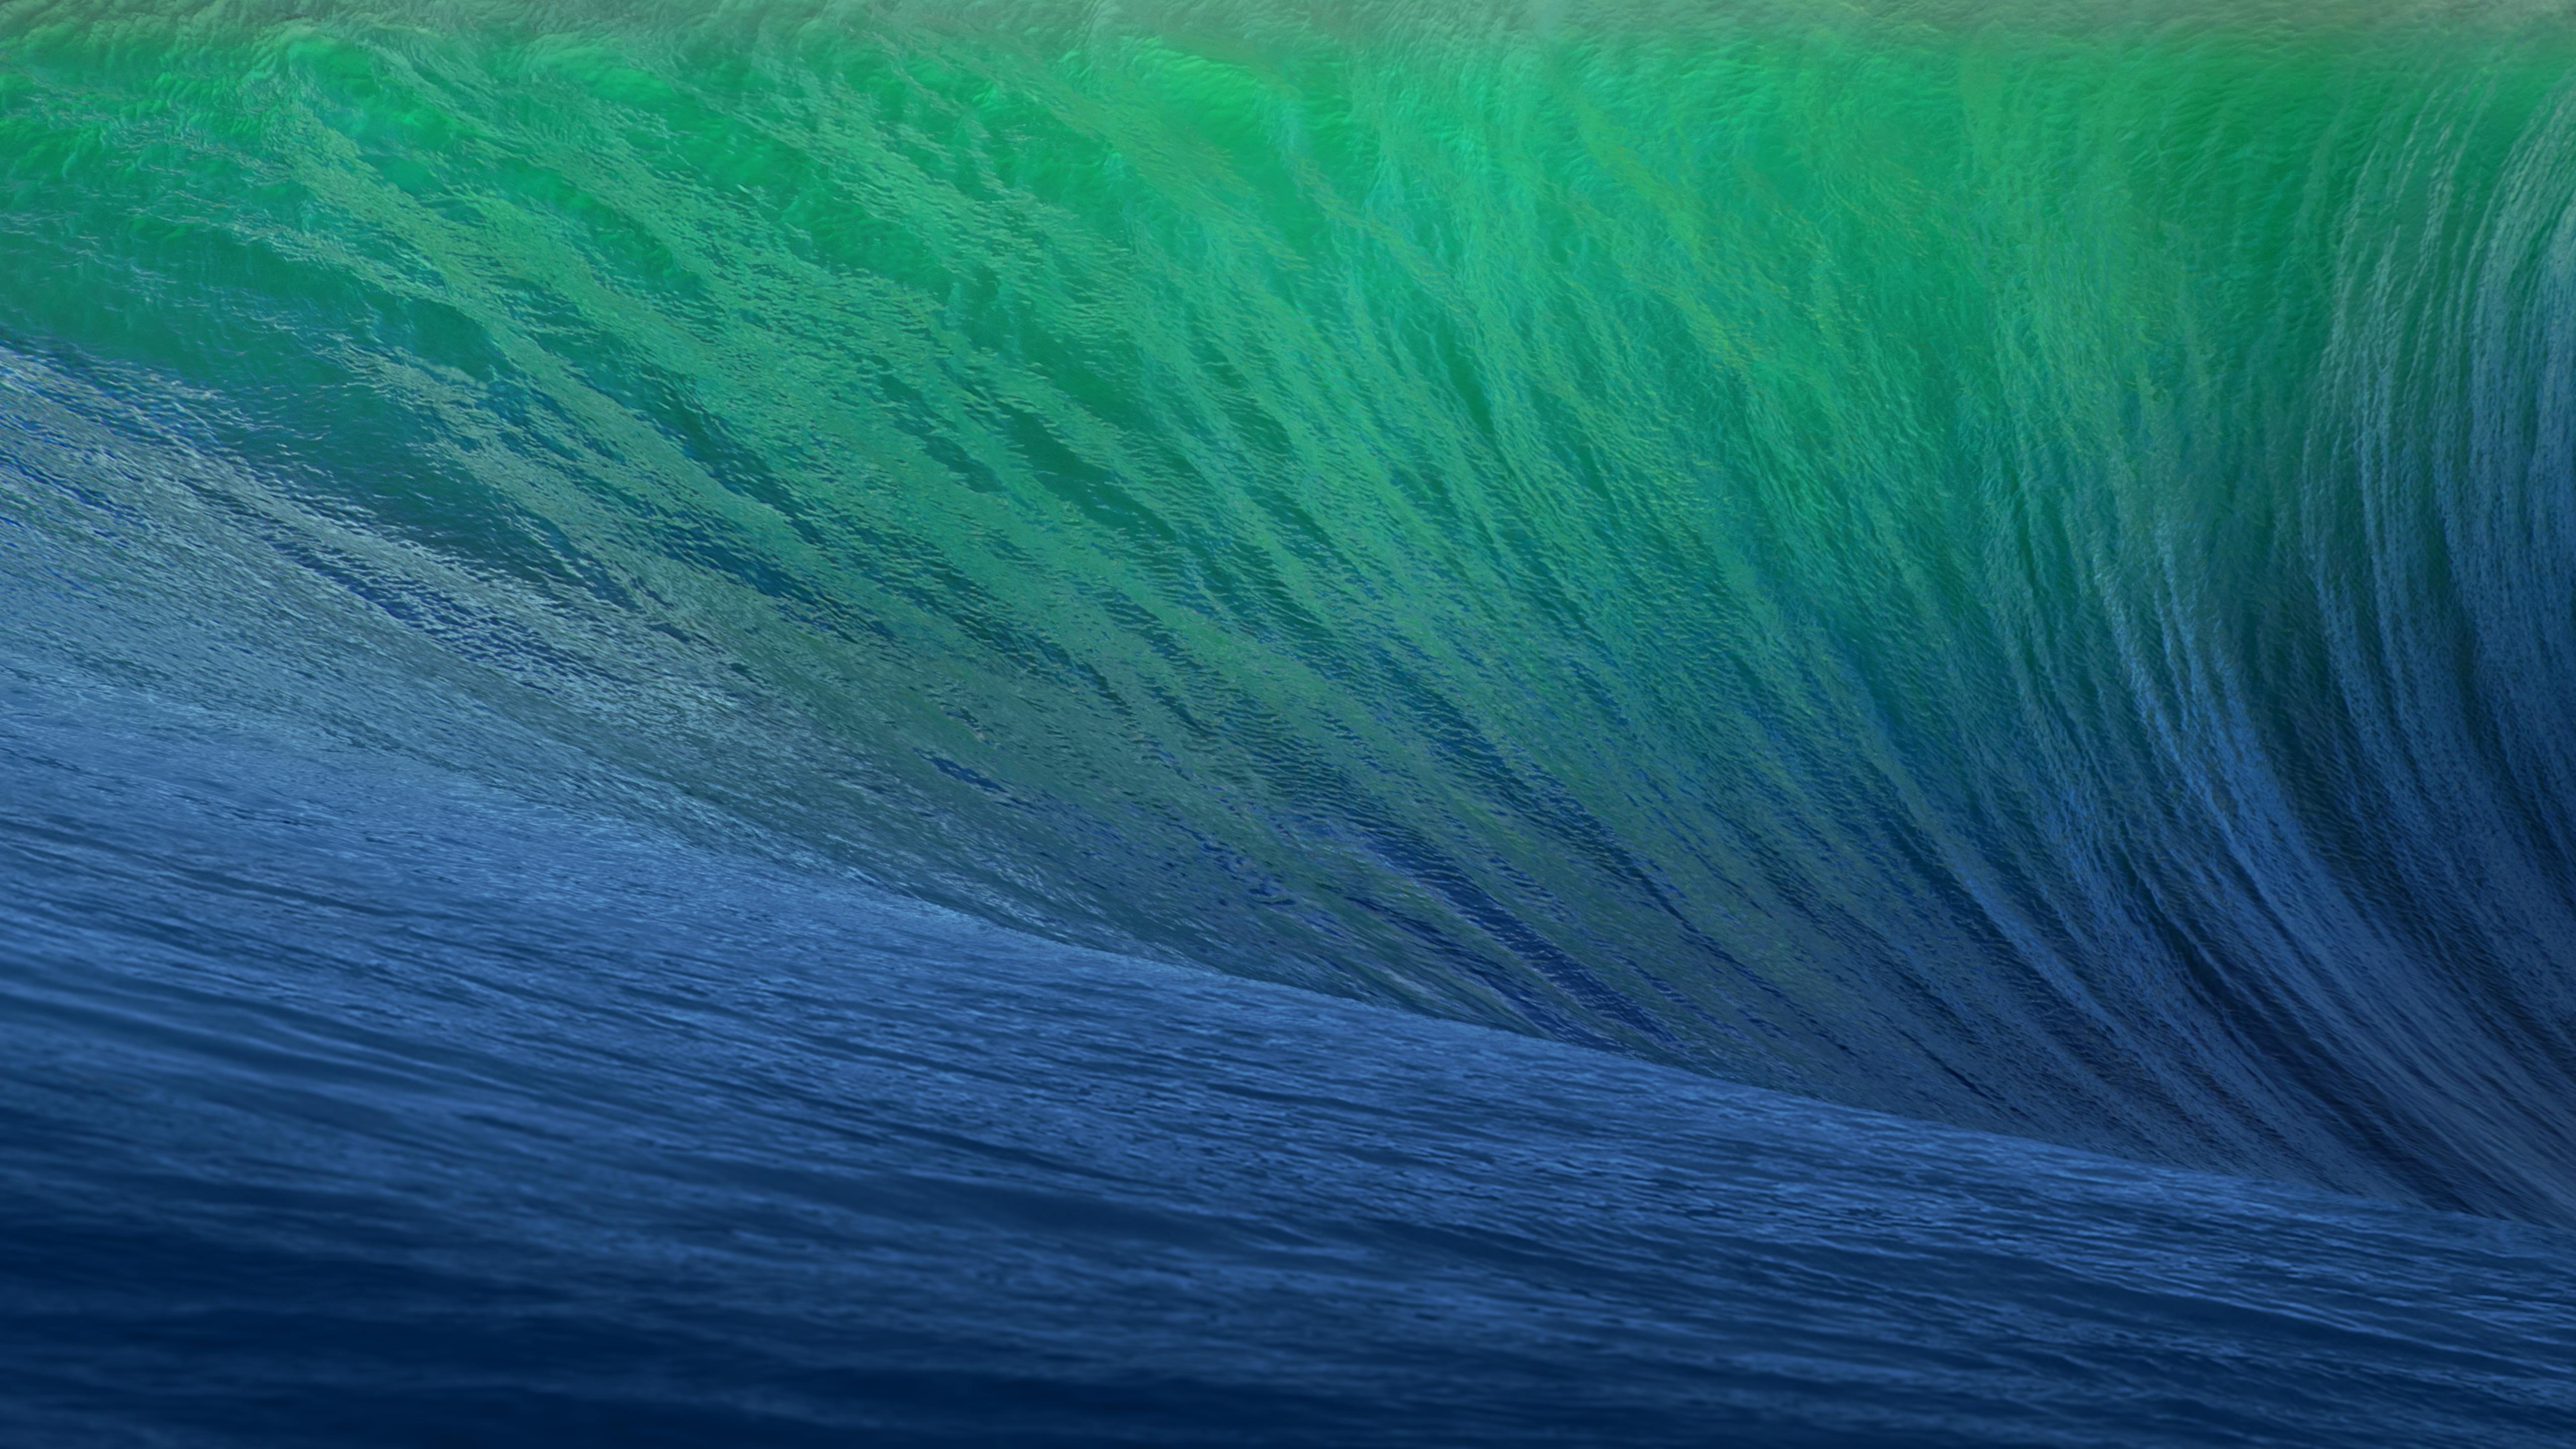 5K Apple Retina Displays Coming New Wallpaper for OS X 109 5120x2880